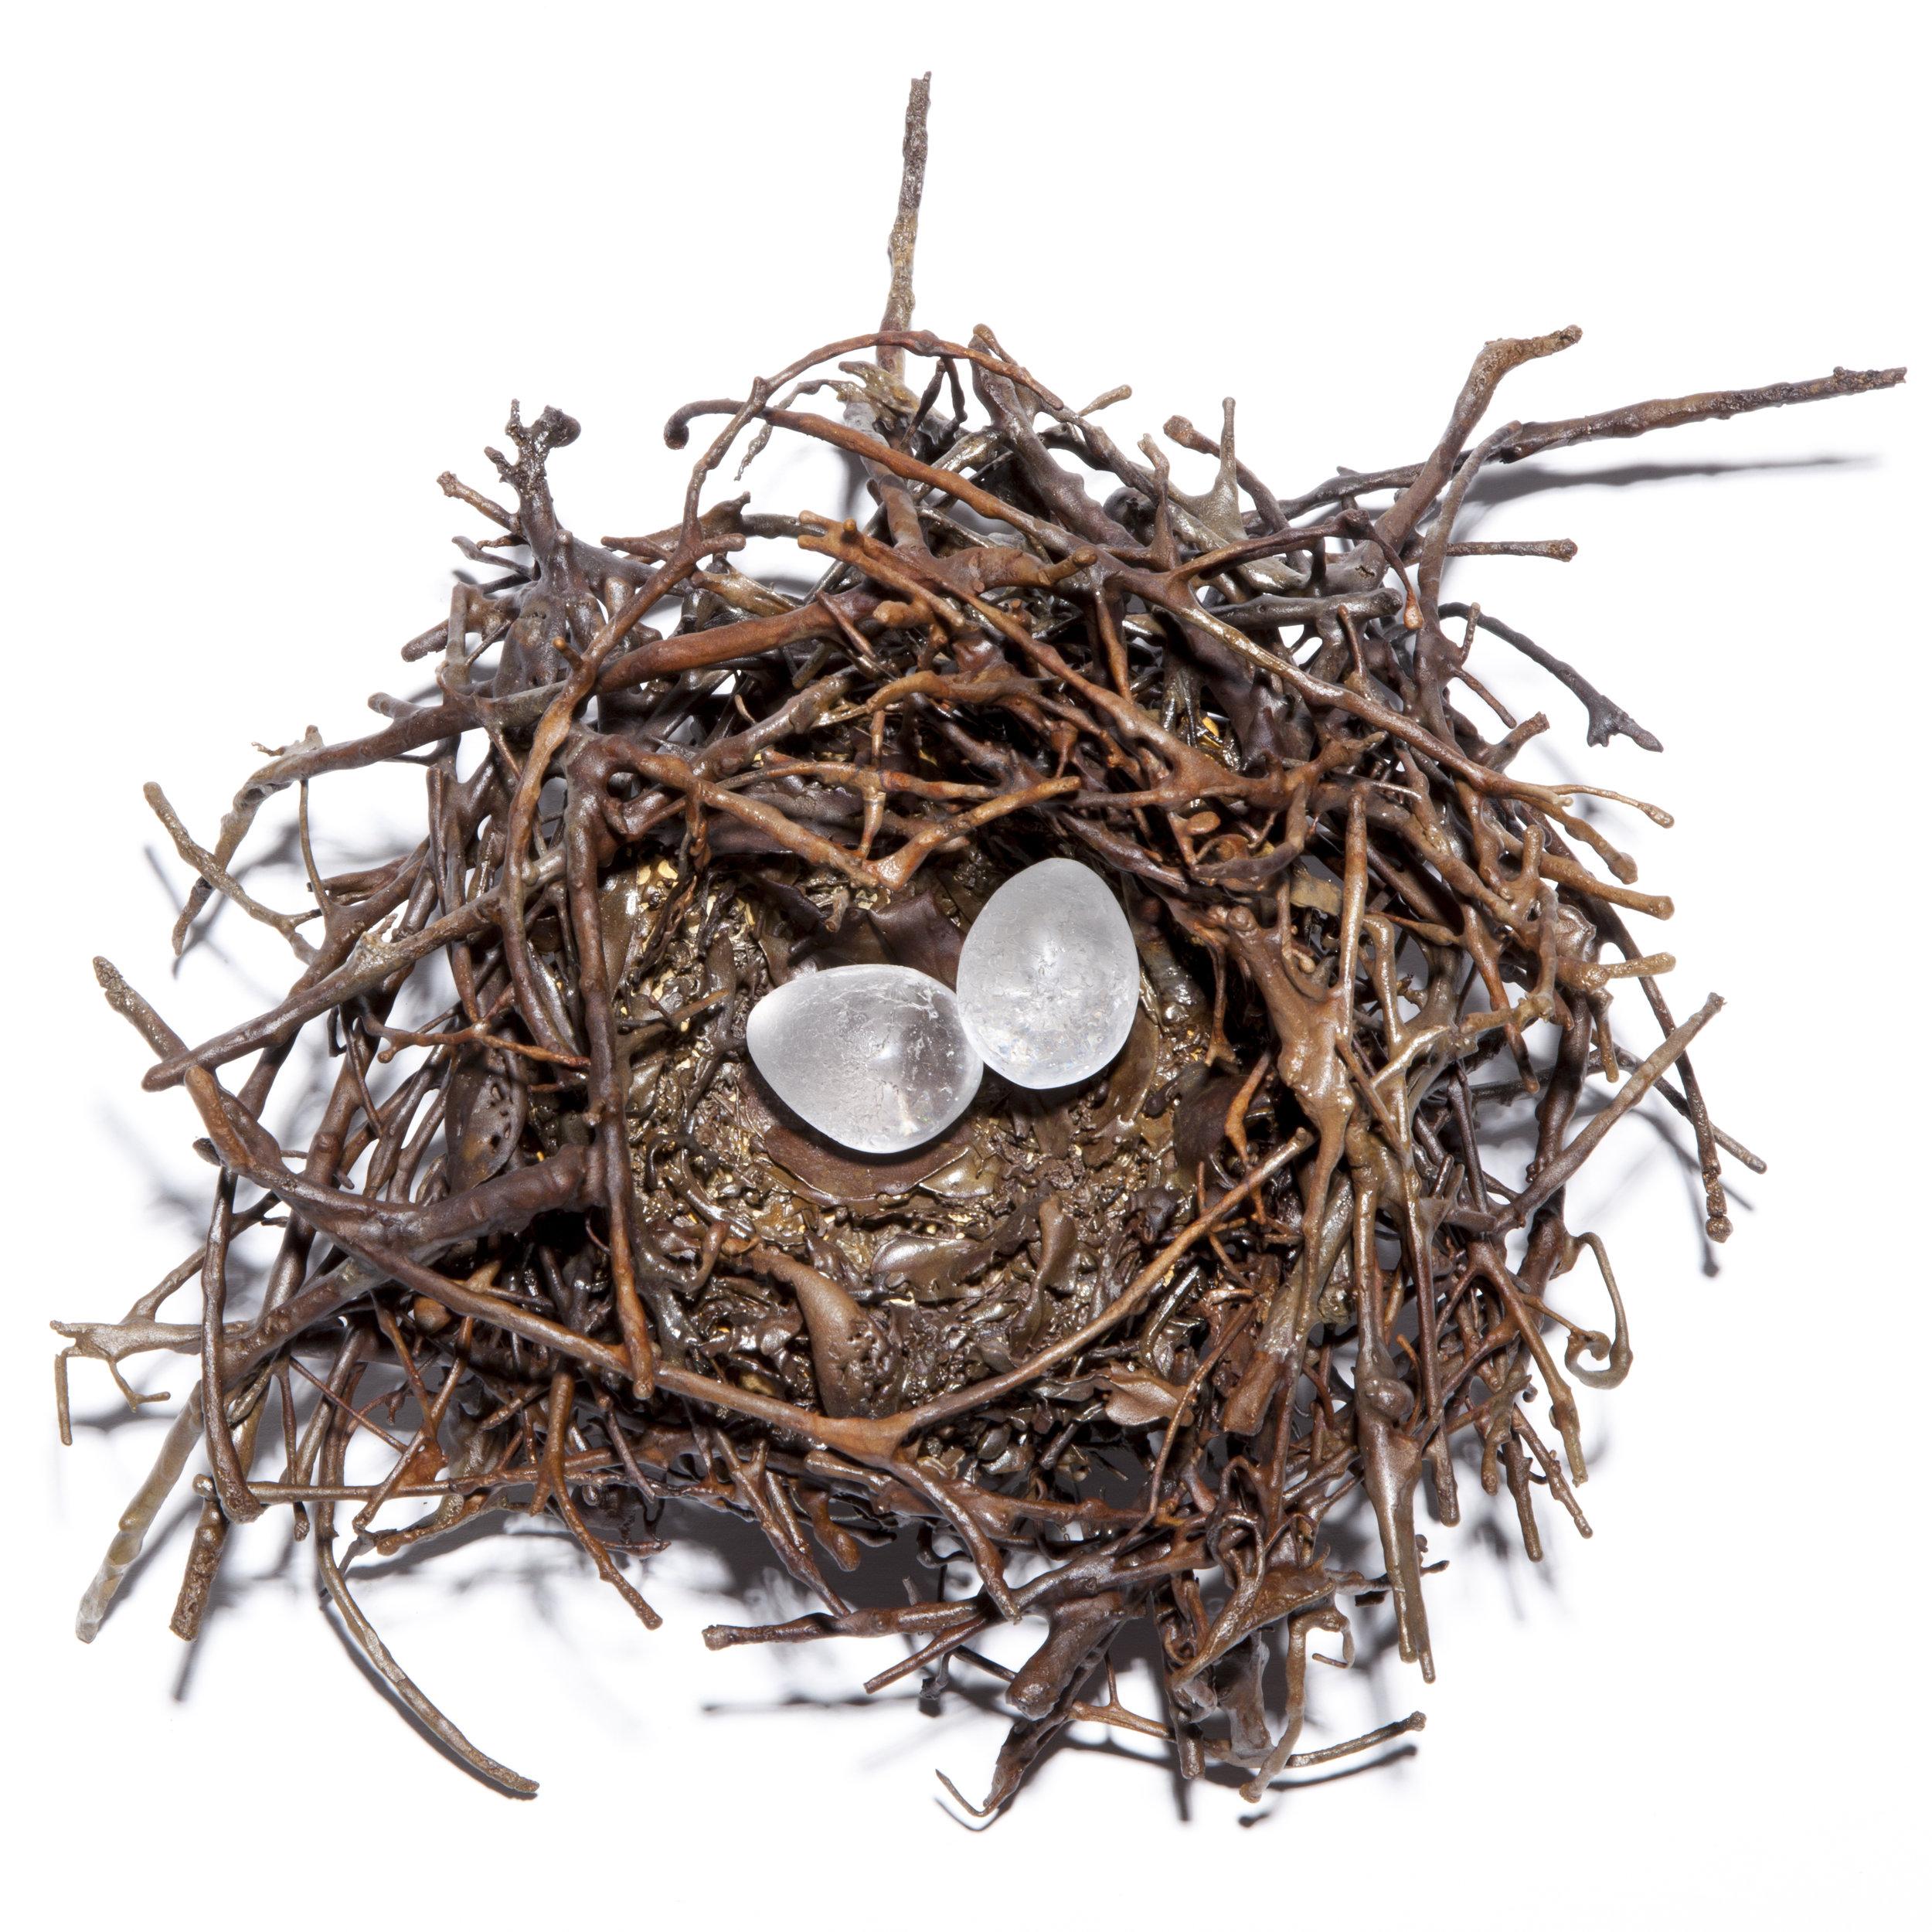 BaleCreekAllen Nests-014.jpg